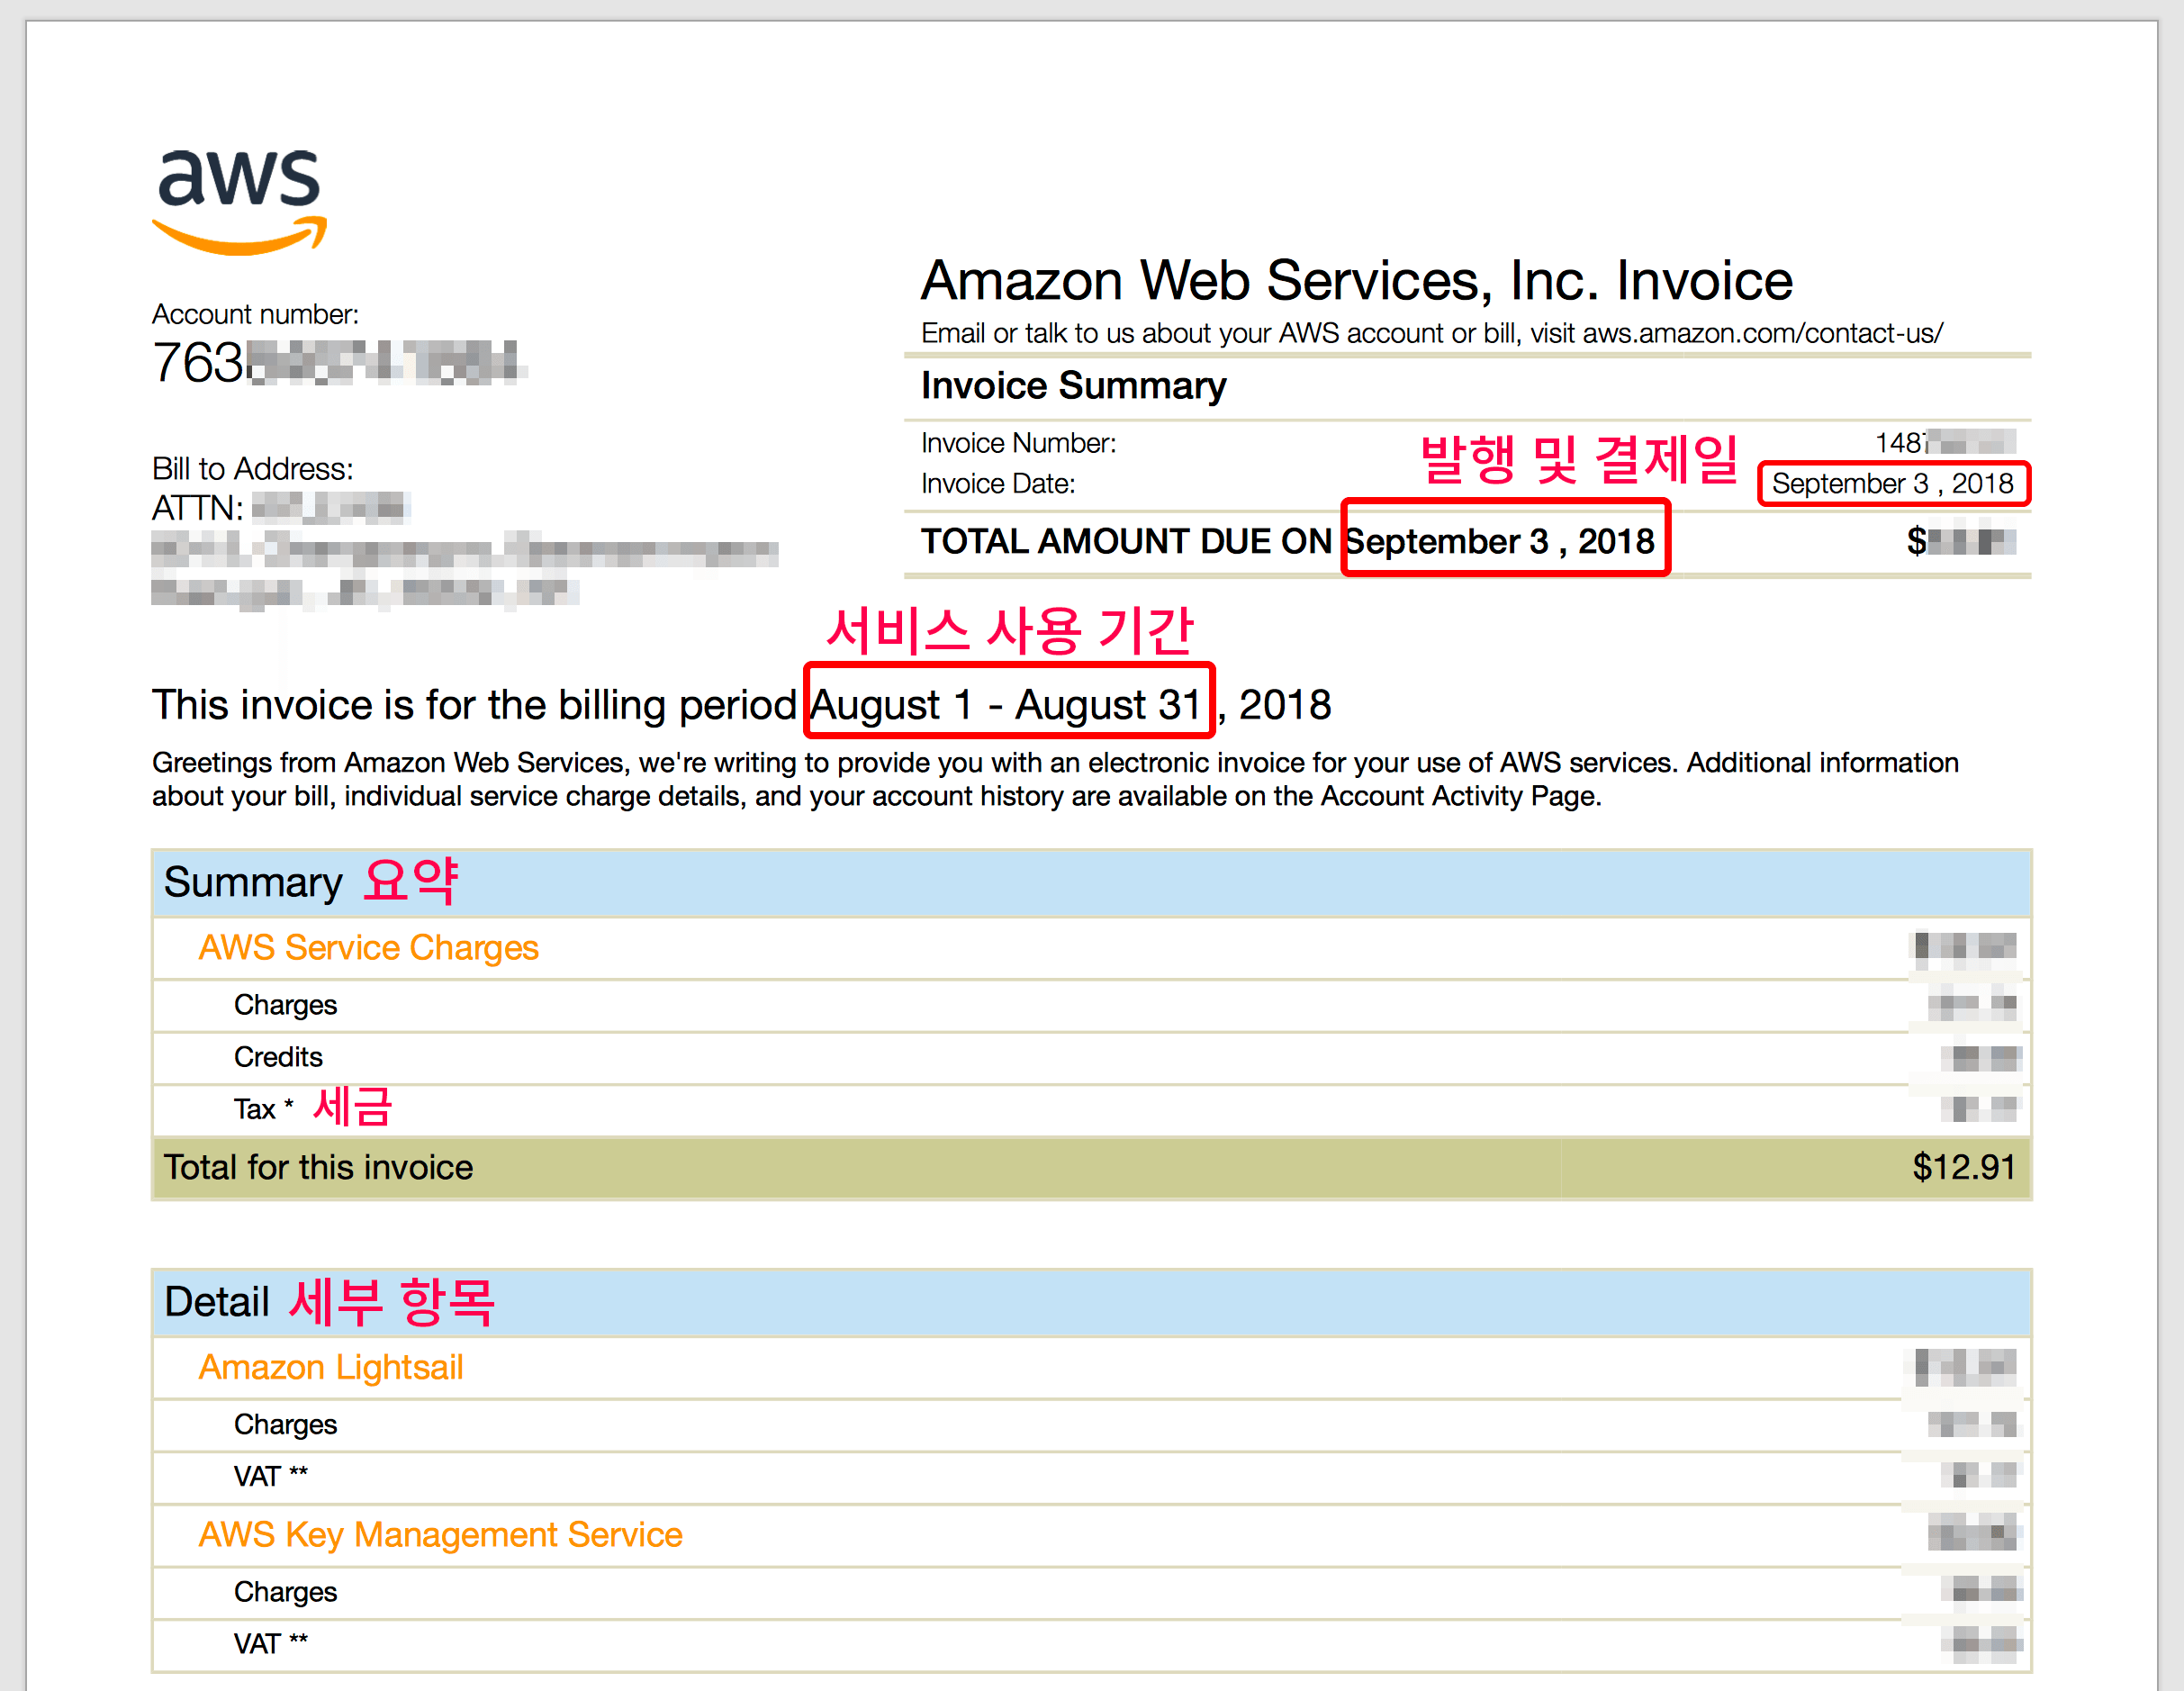 AWS 로고와 계정 번호, 결제일 및 서비스 사용기간 그리고 요약과 세부항목으로 나누어져 있다